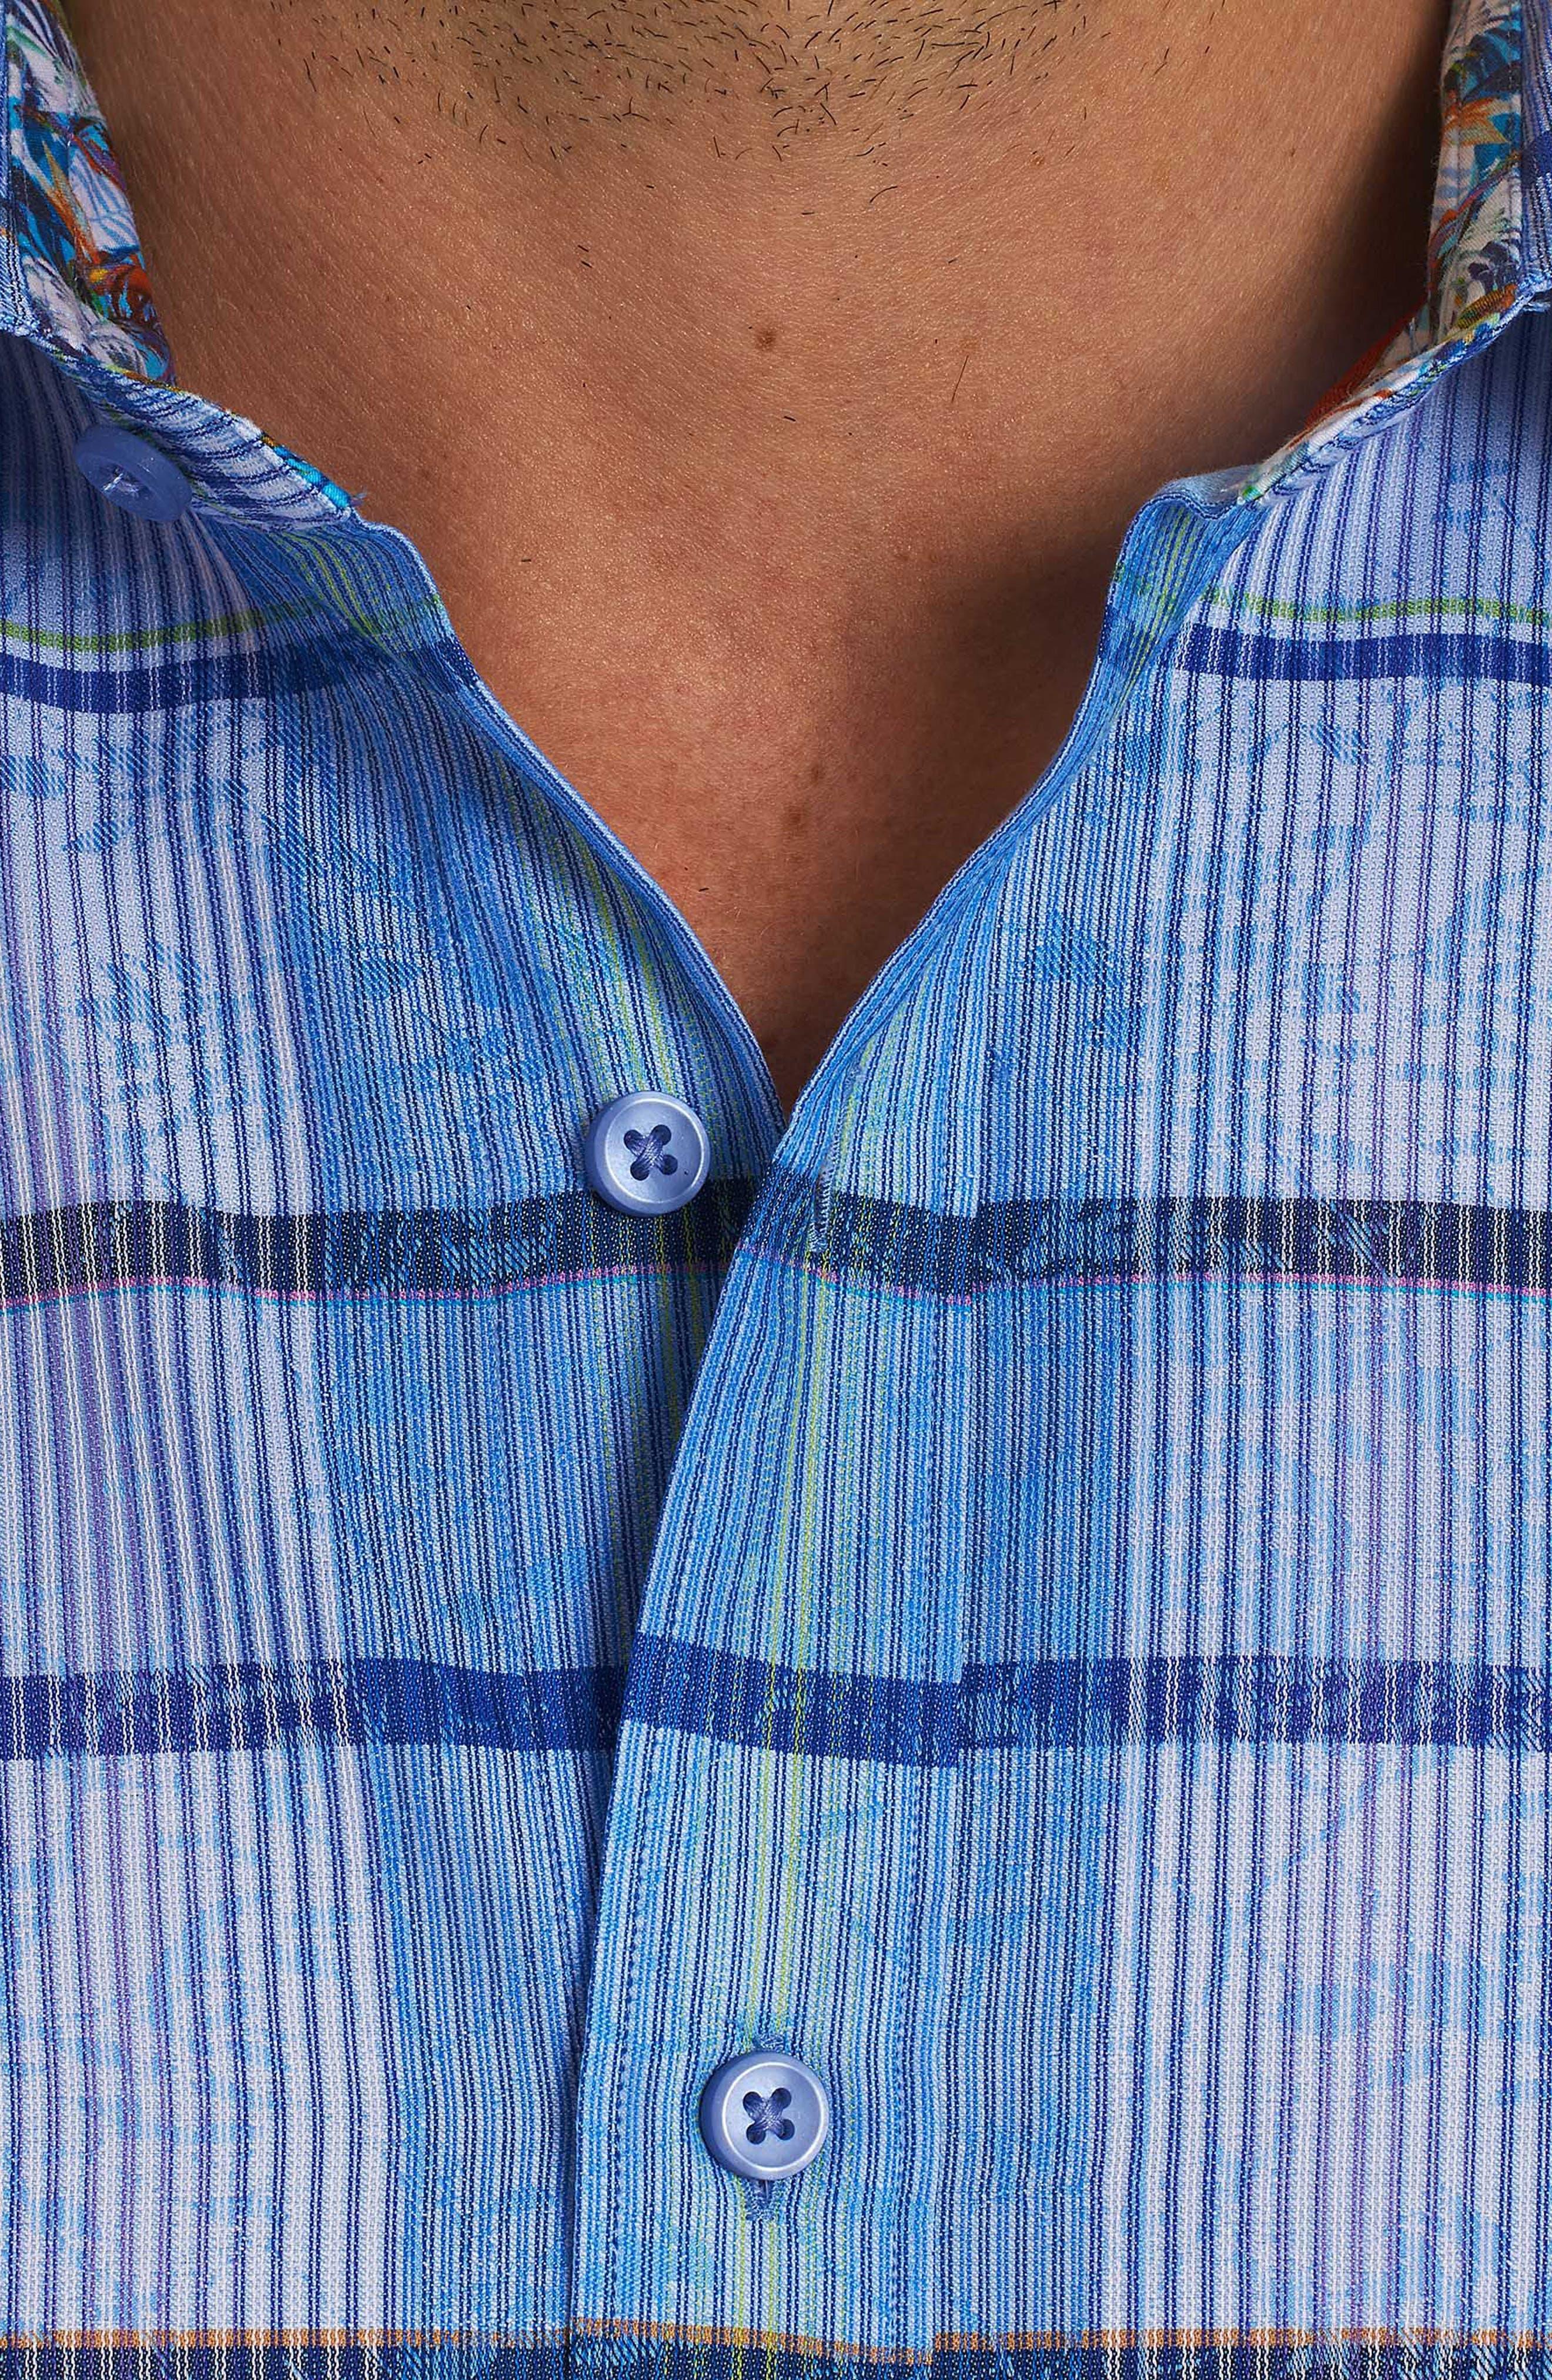 Ferro Classic Fit Sport Shirt,                             Alternate thumbnail 5, color,                             400